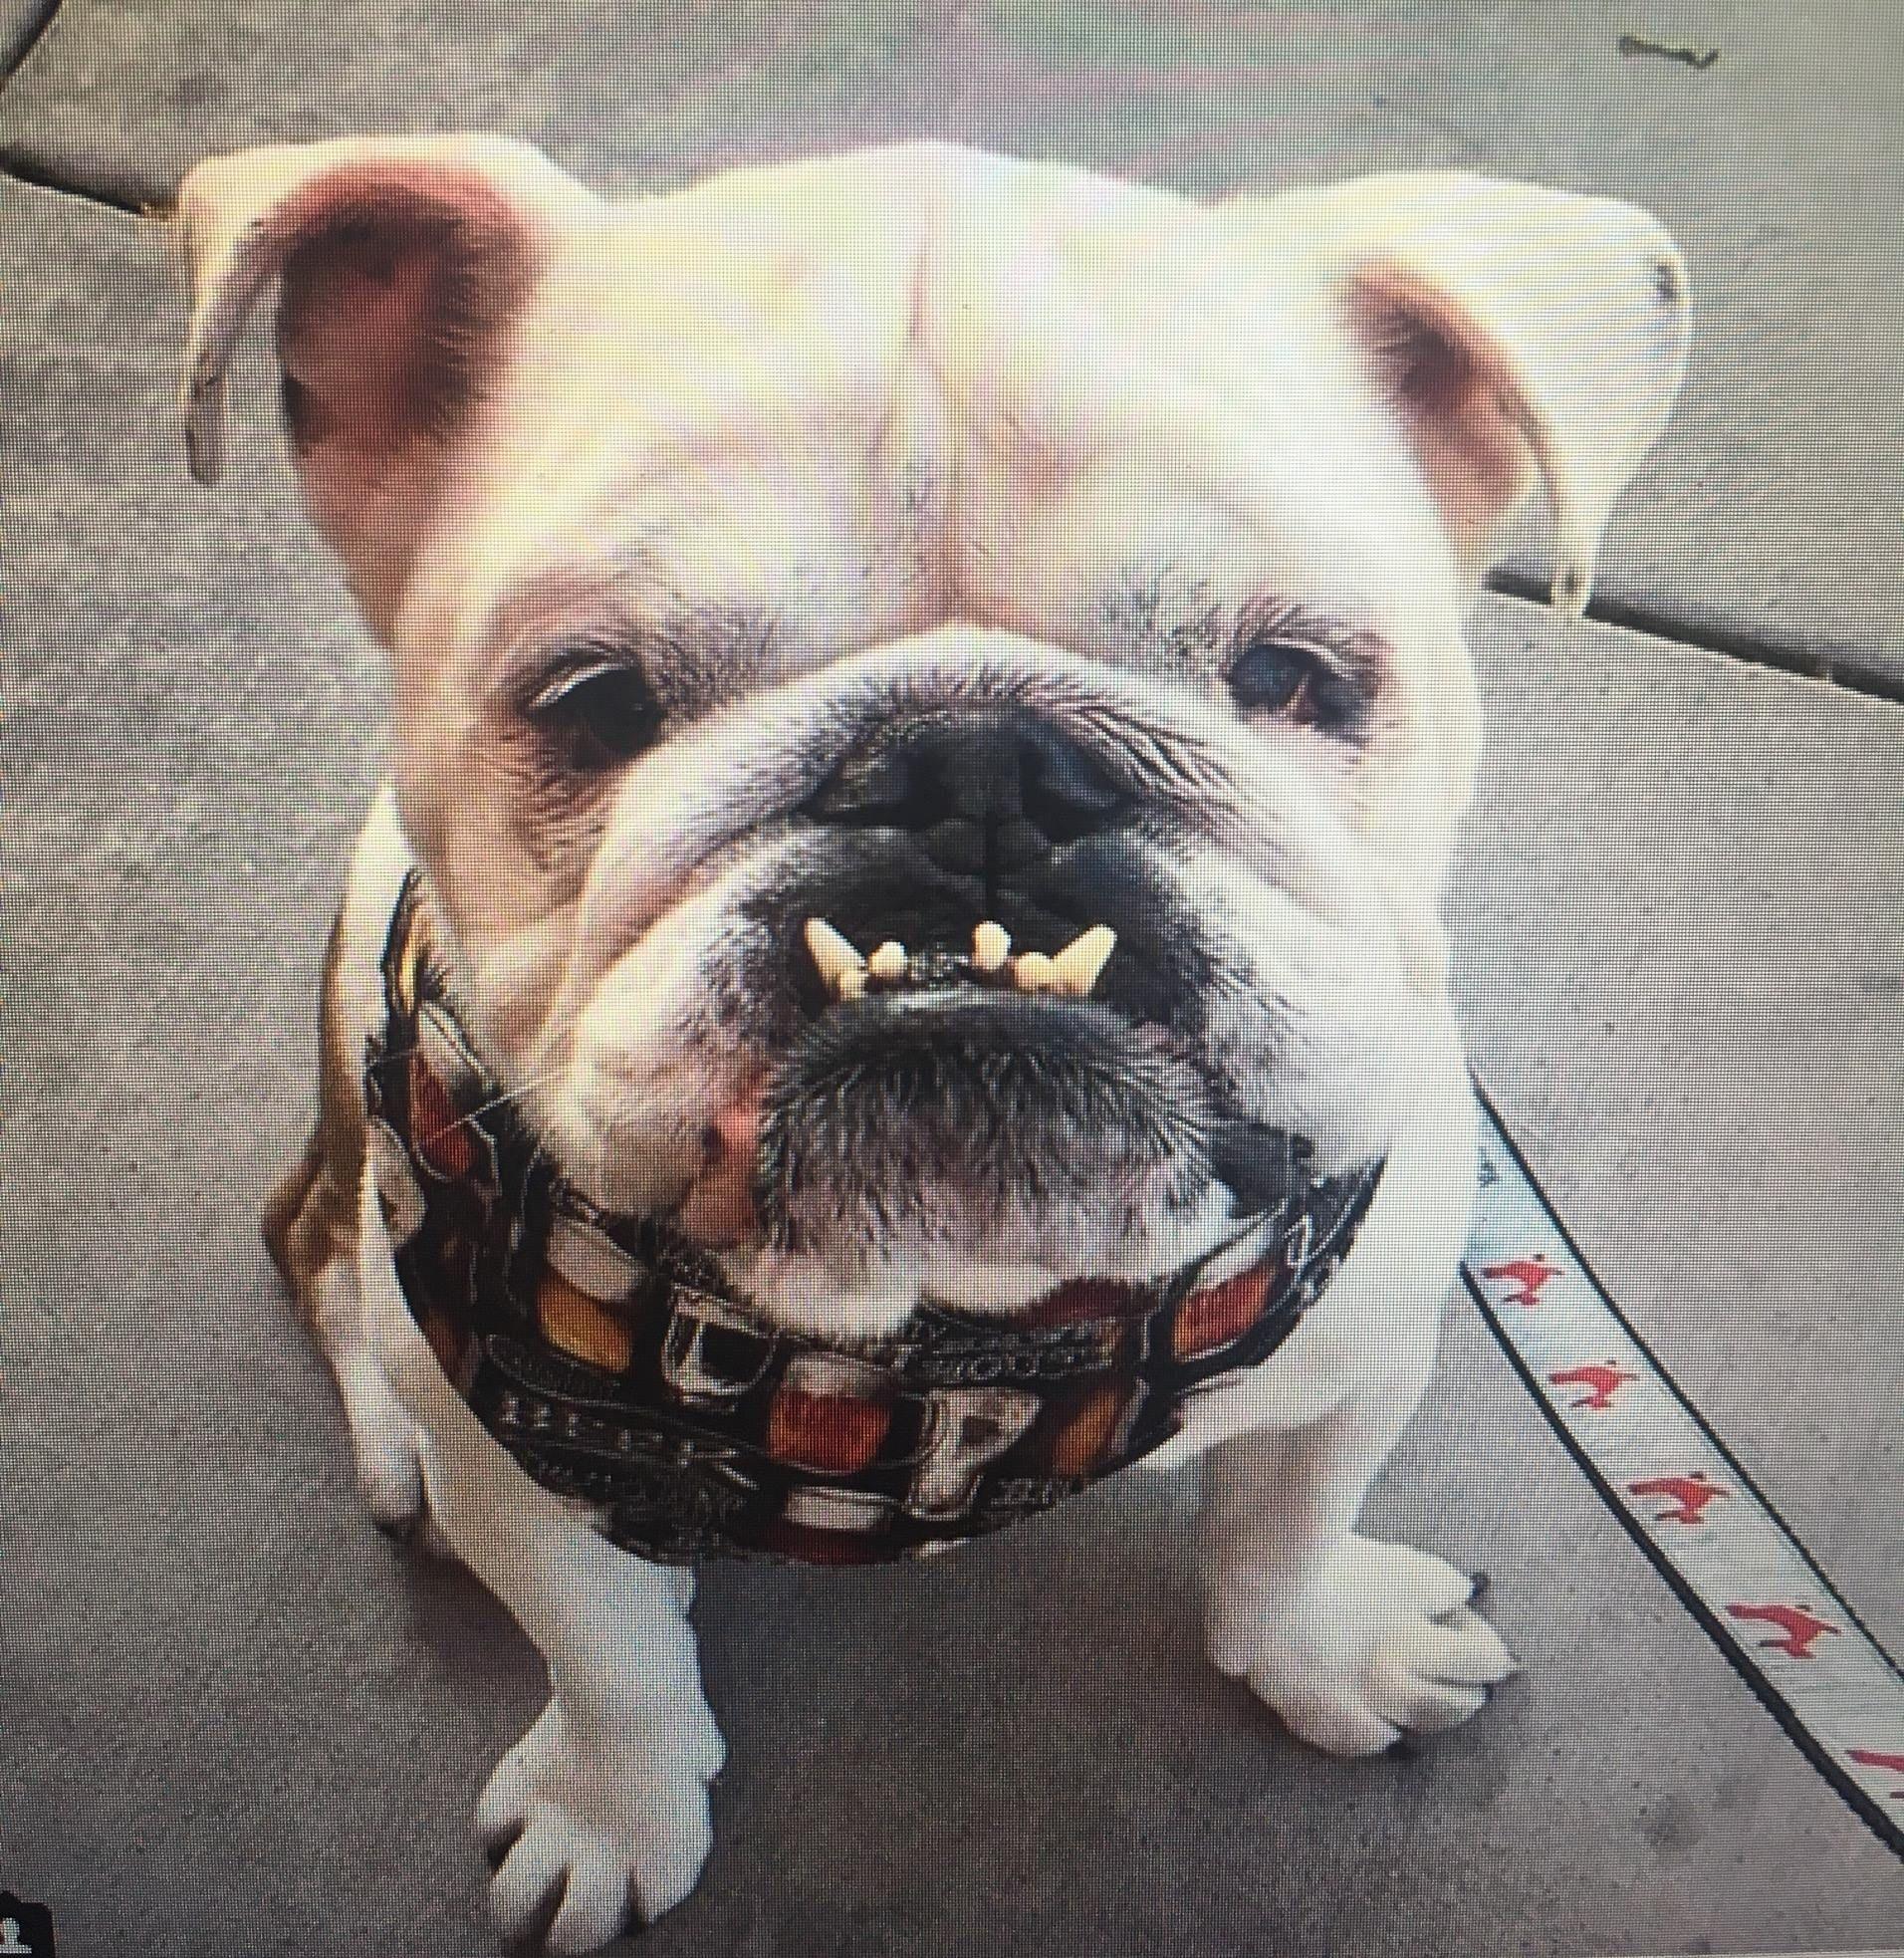 mac and i love turtle! 😍 english and french bulldog mix